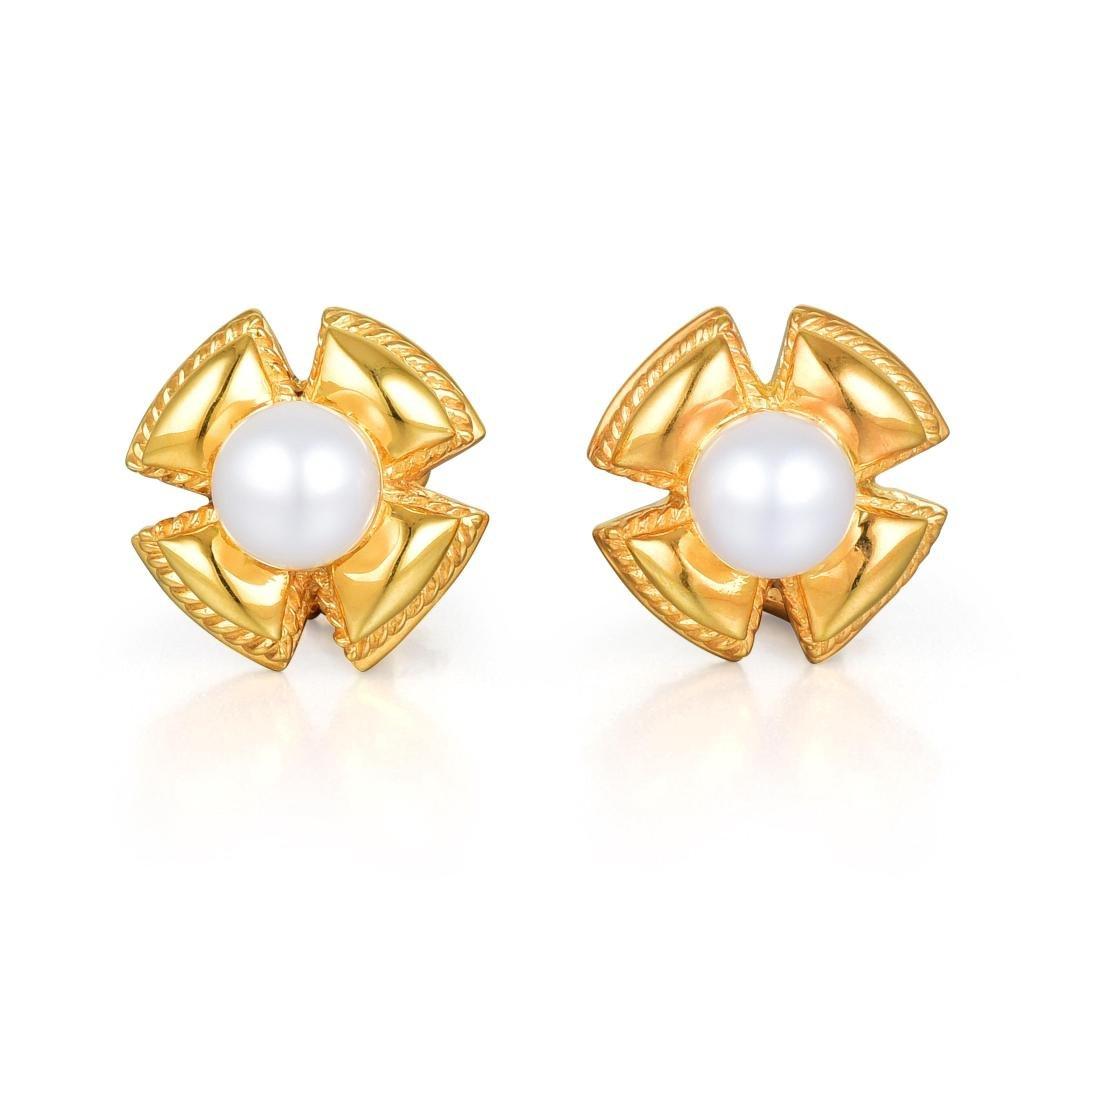 Tiffany & Co. by Jean Schlumberger Pearl Ear Clips